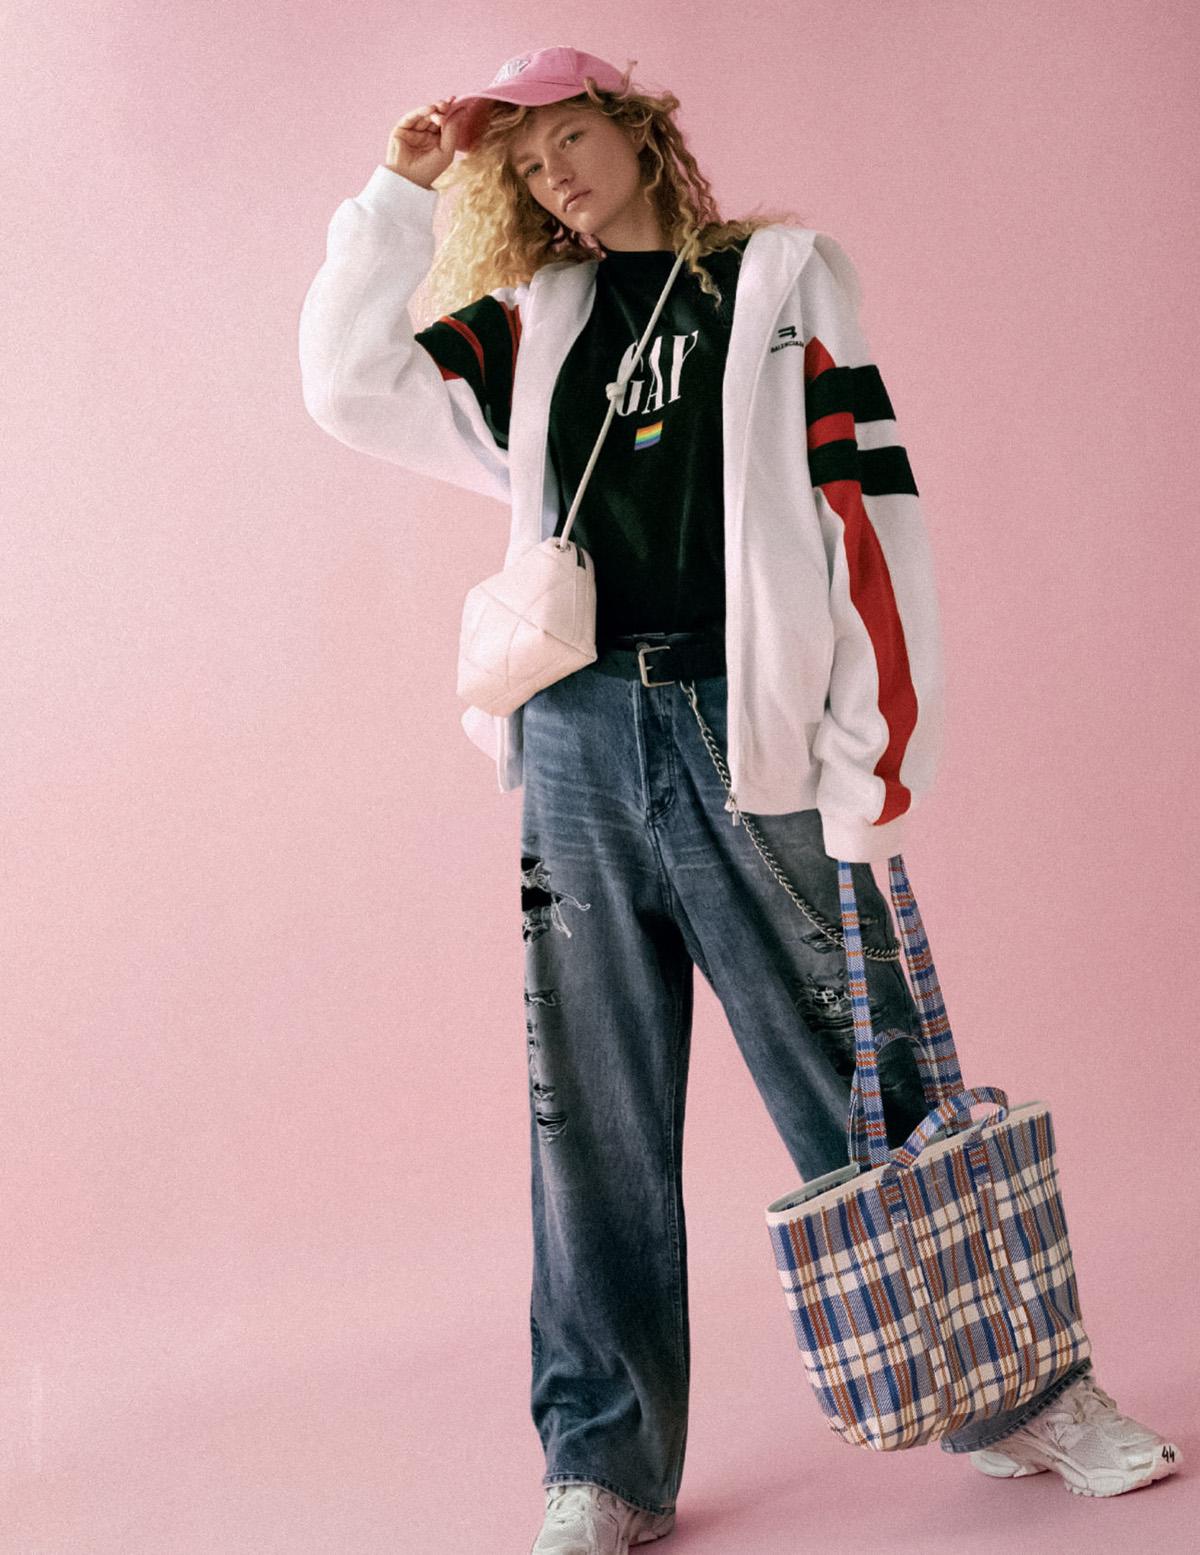 Sophia Ahrens covers Elle Italia October 7th, 2021 by Xavi Gordo